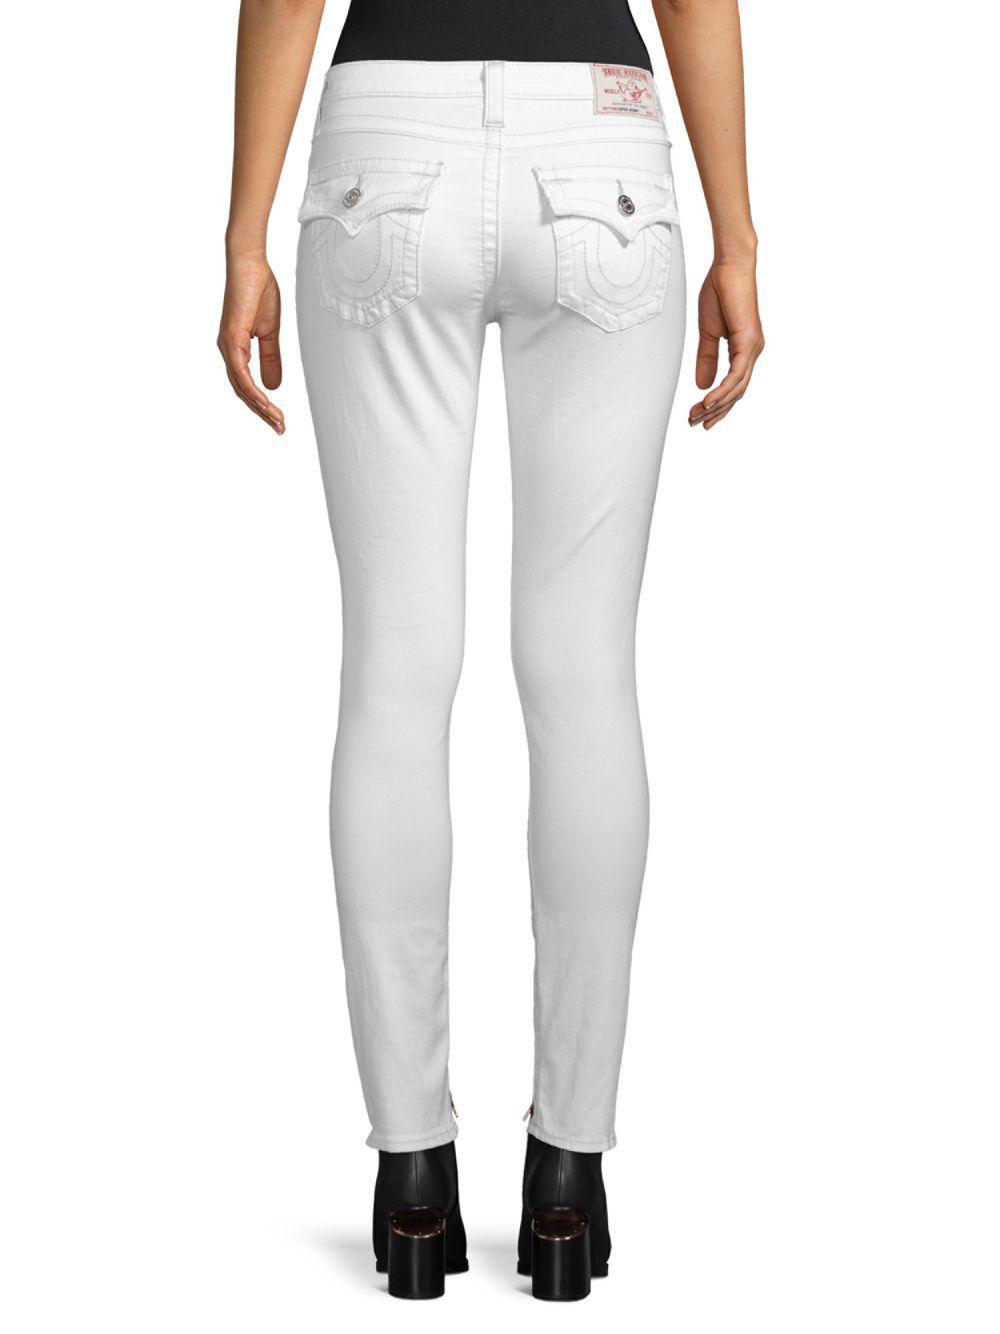 True Religion Denim Super-skinny Distressed Jeans in White